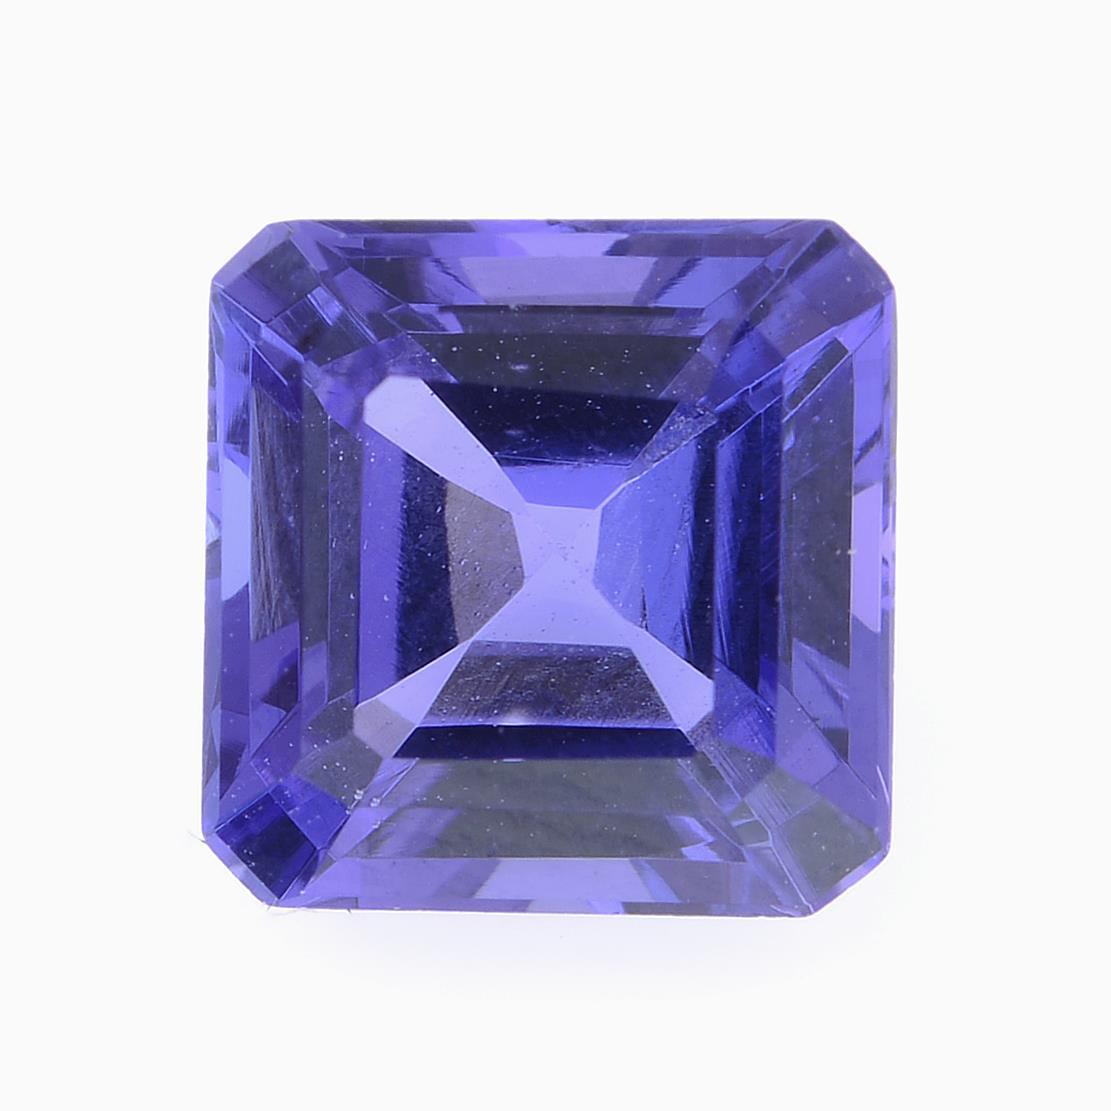 A square shape tanzanite weighing 1.77ct.